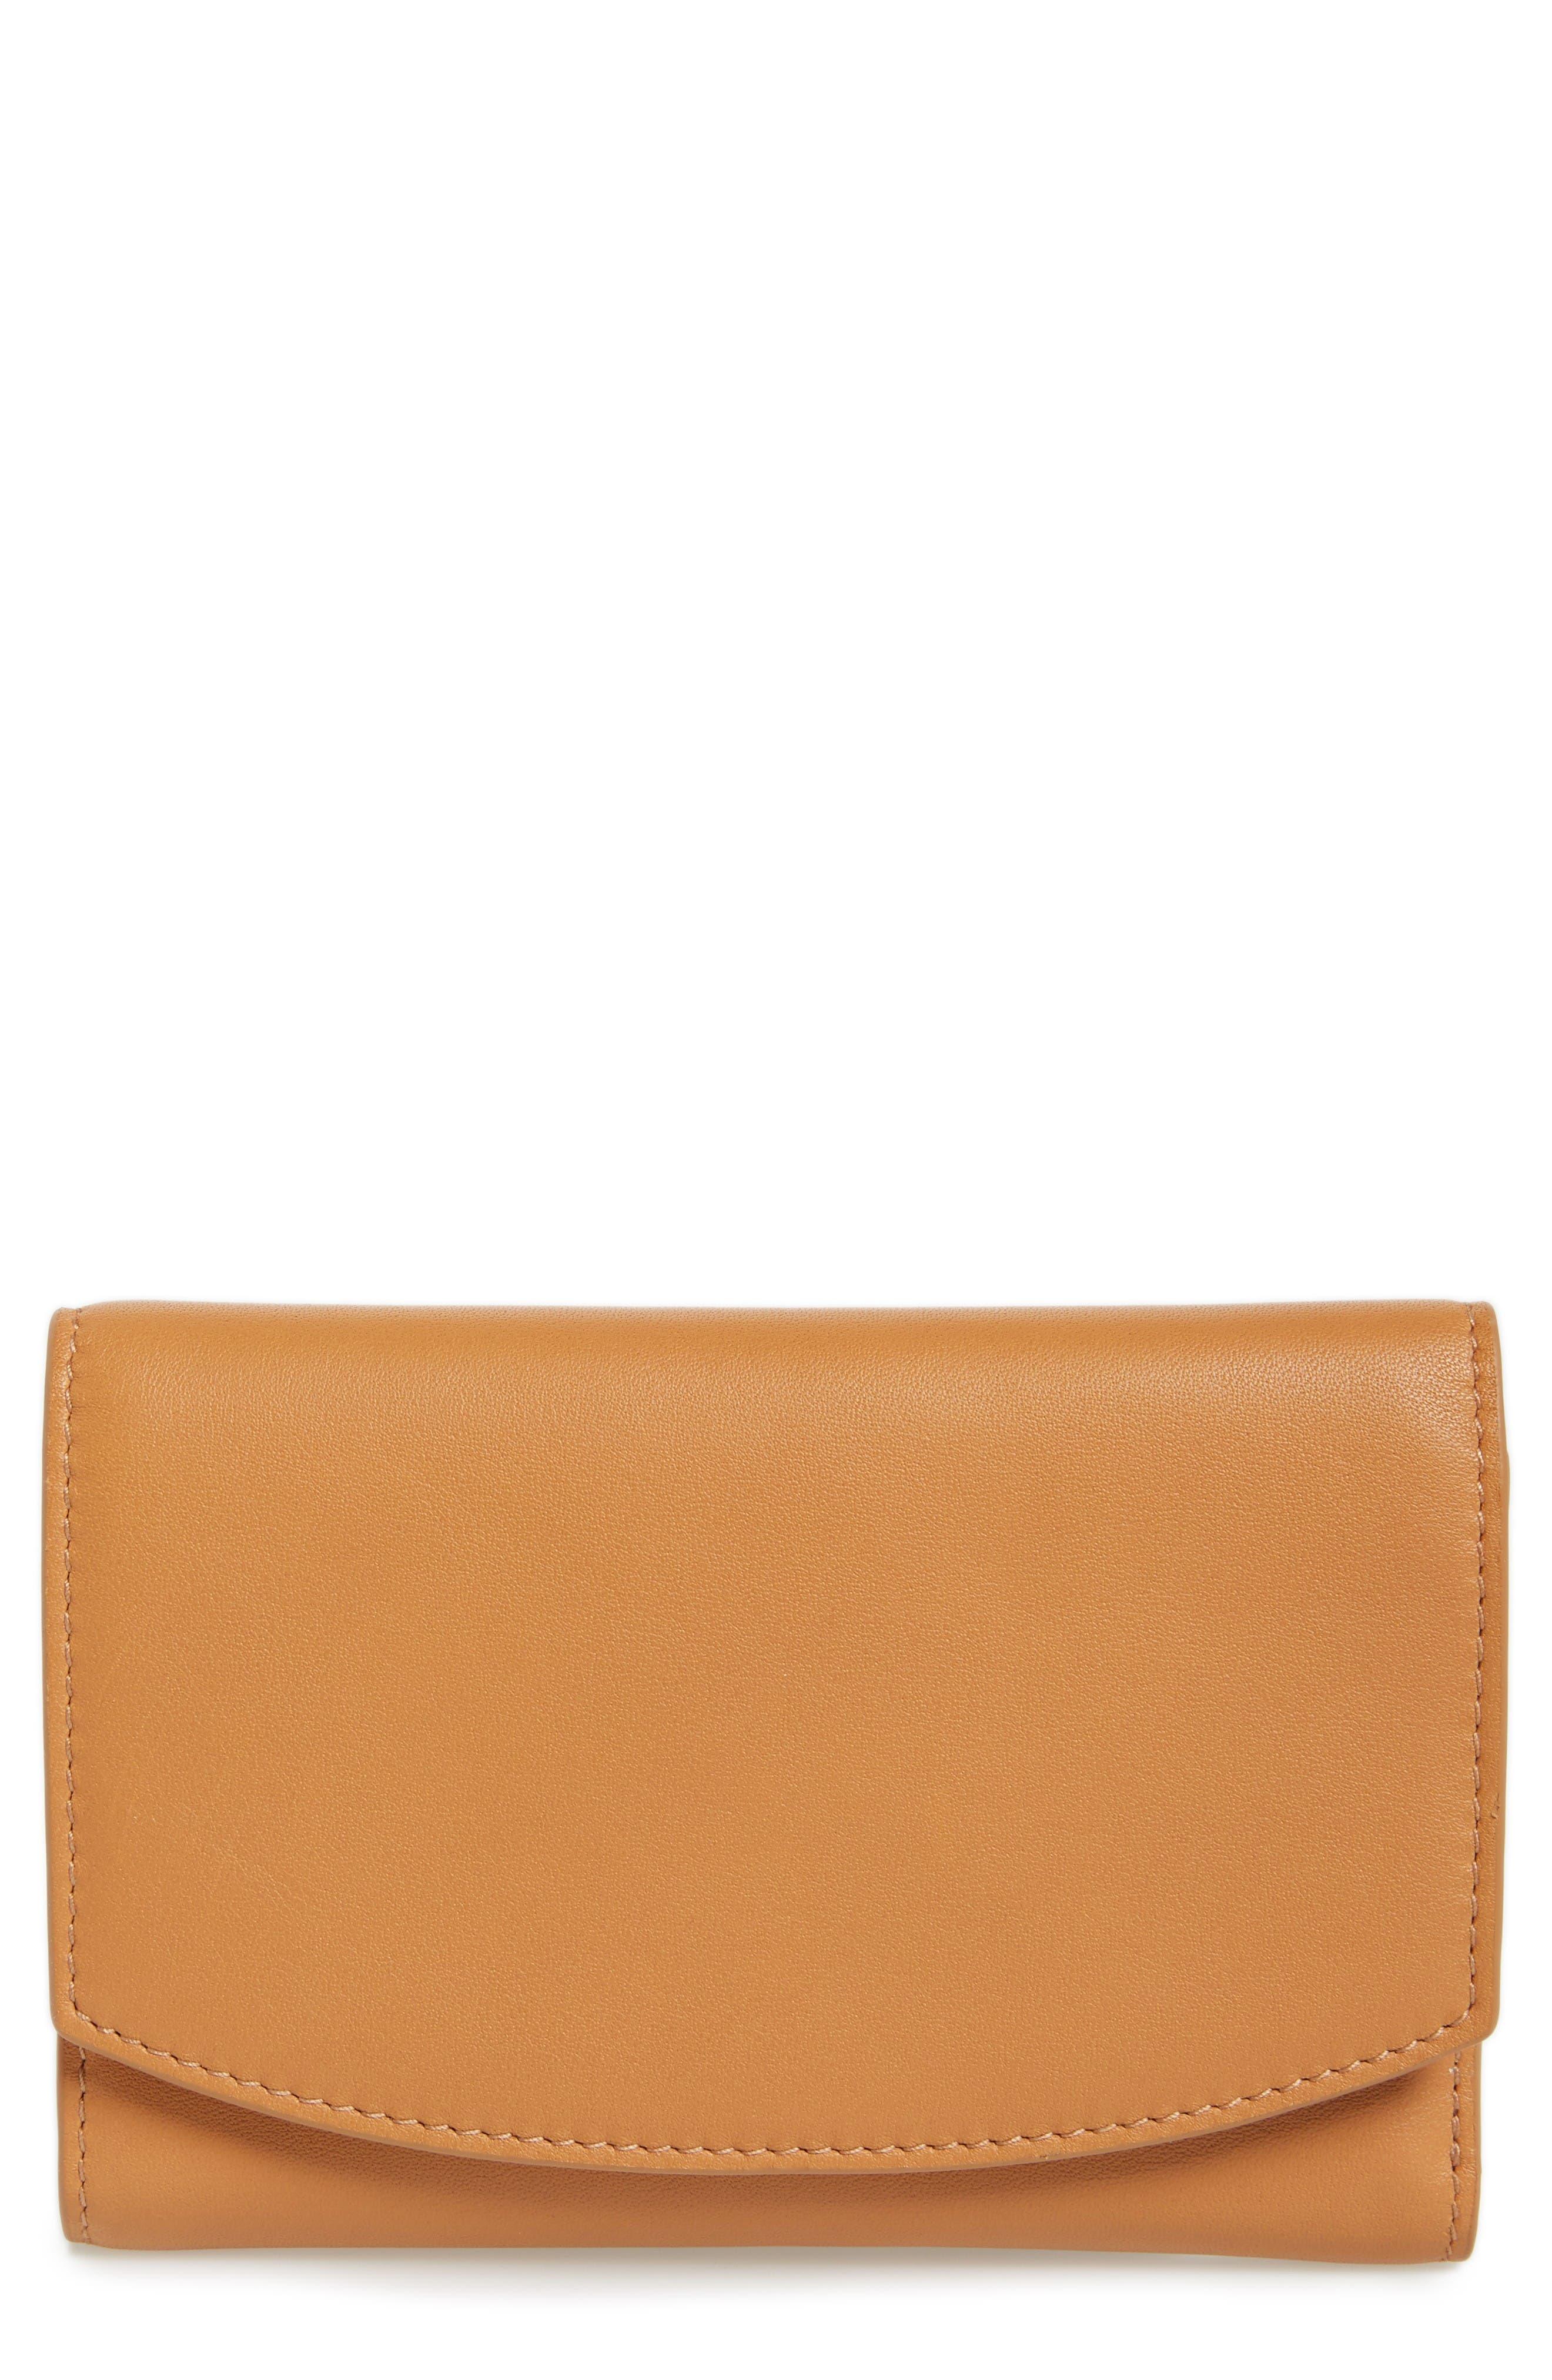 Skagen Compact Leather Flap Wallet